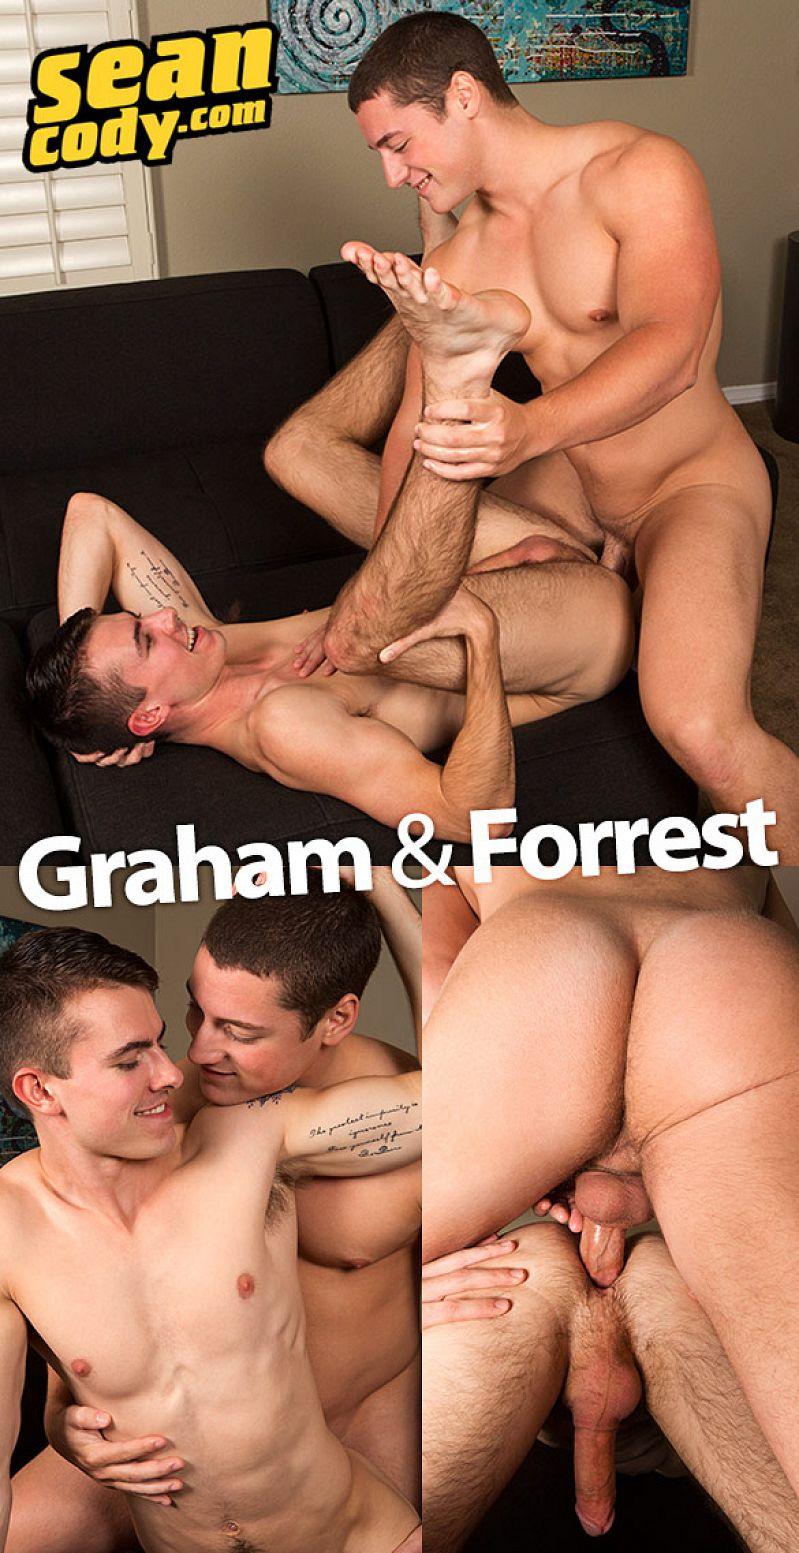 SeanCody – Forrest & Graham (Bareback)